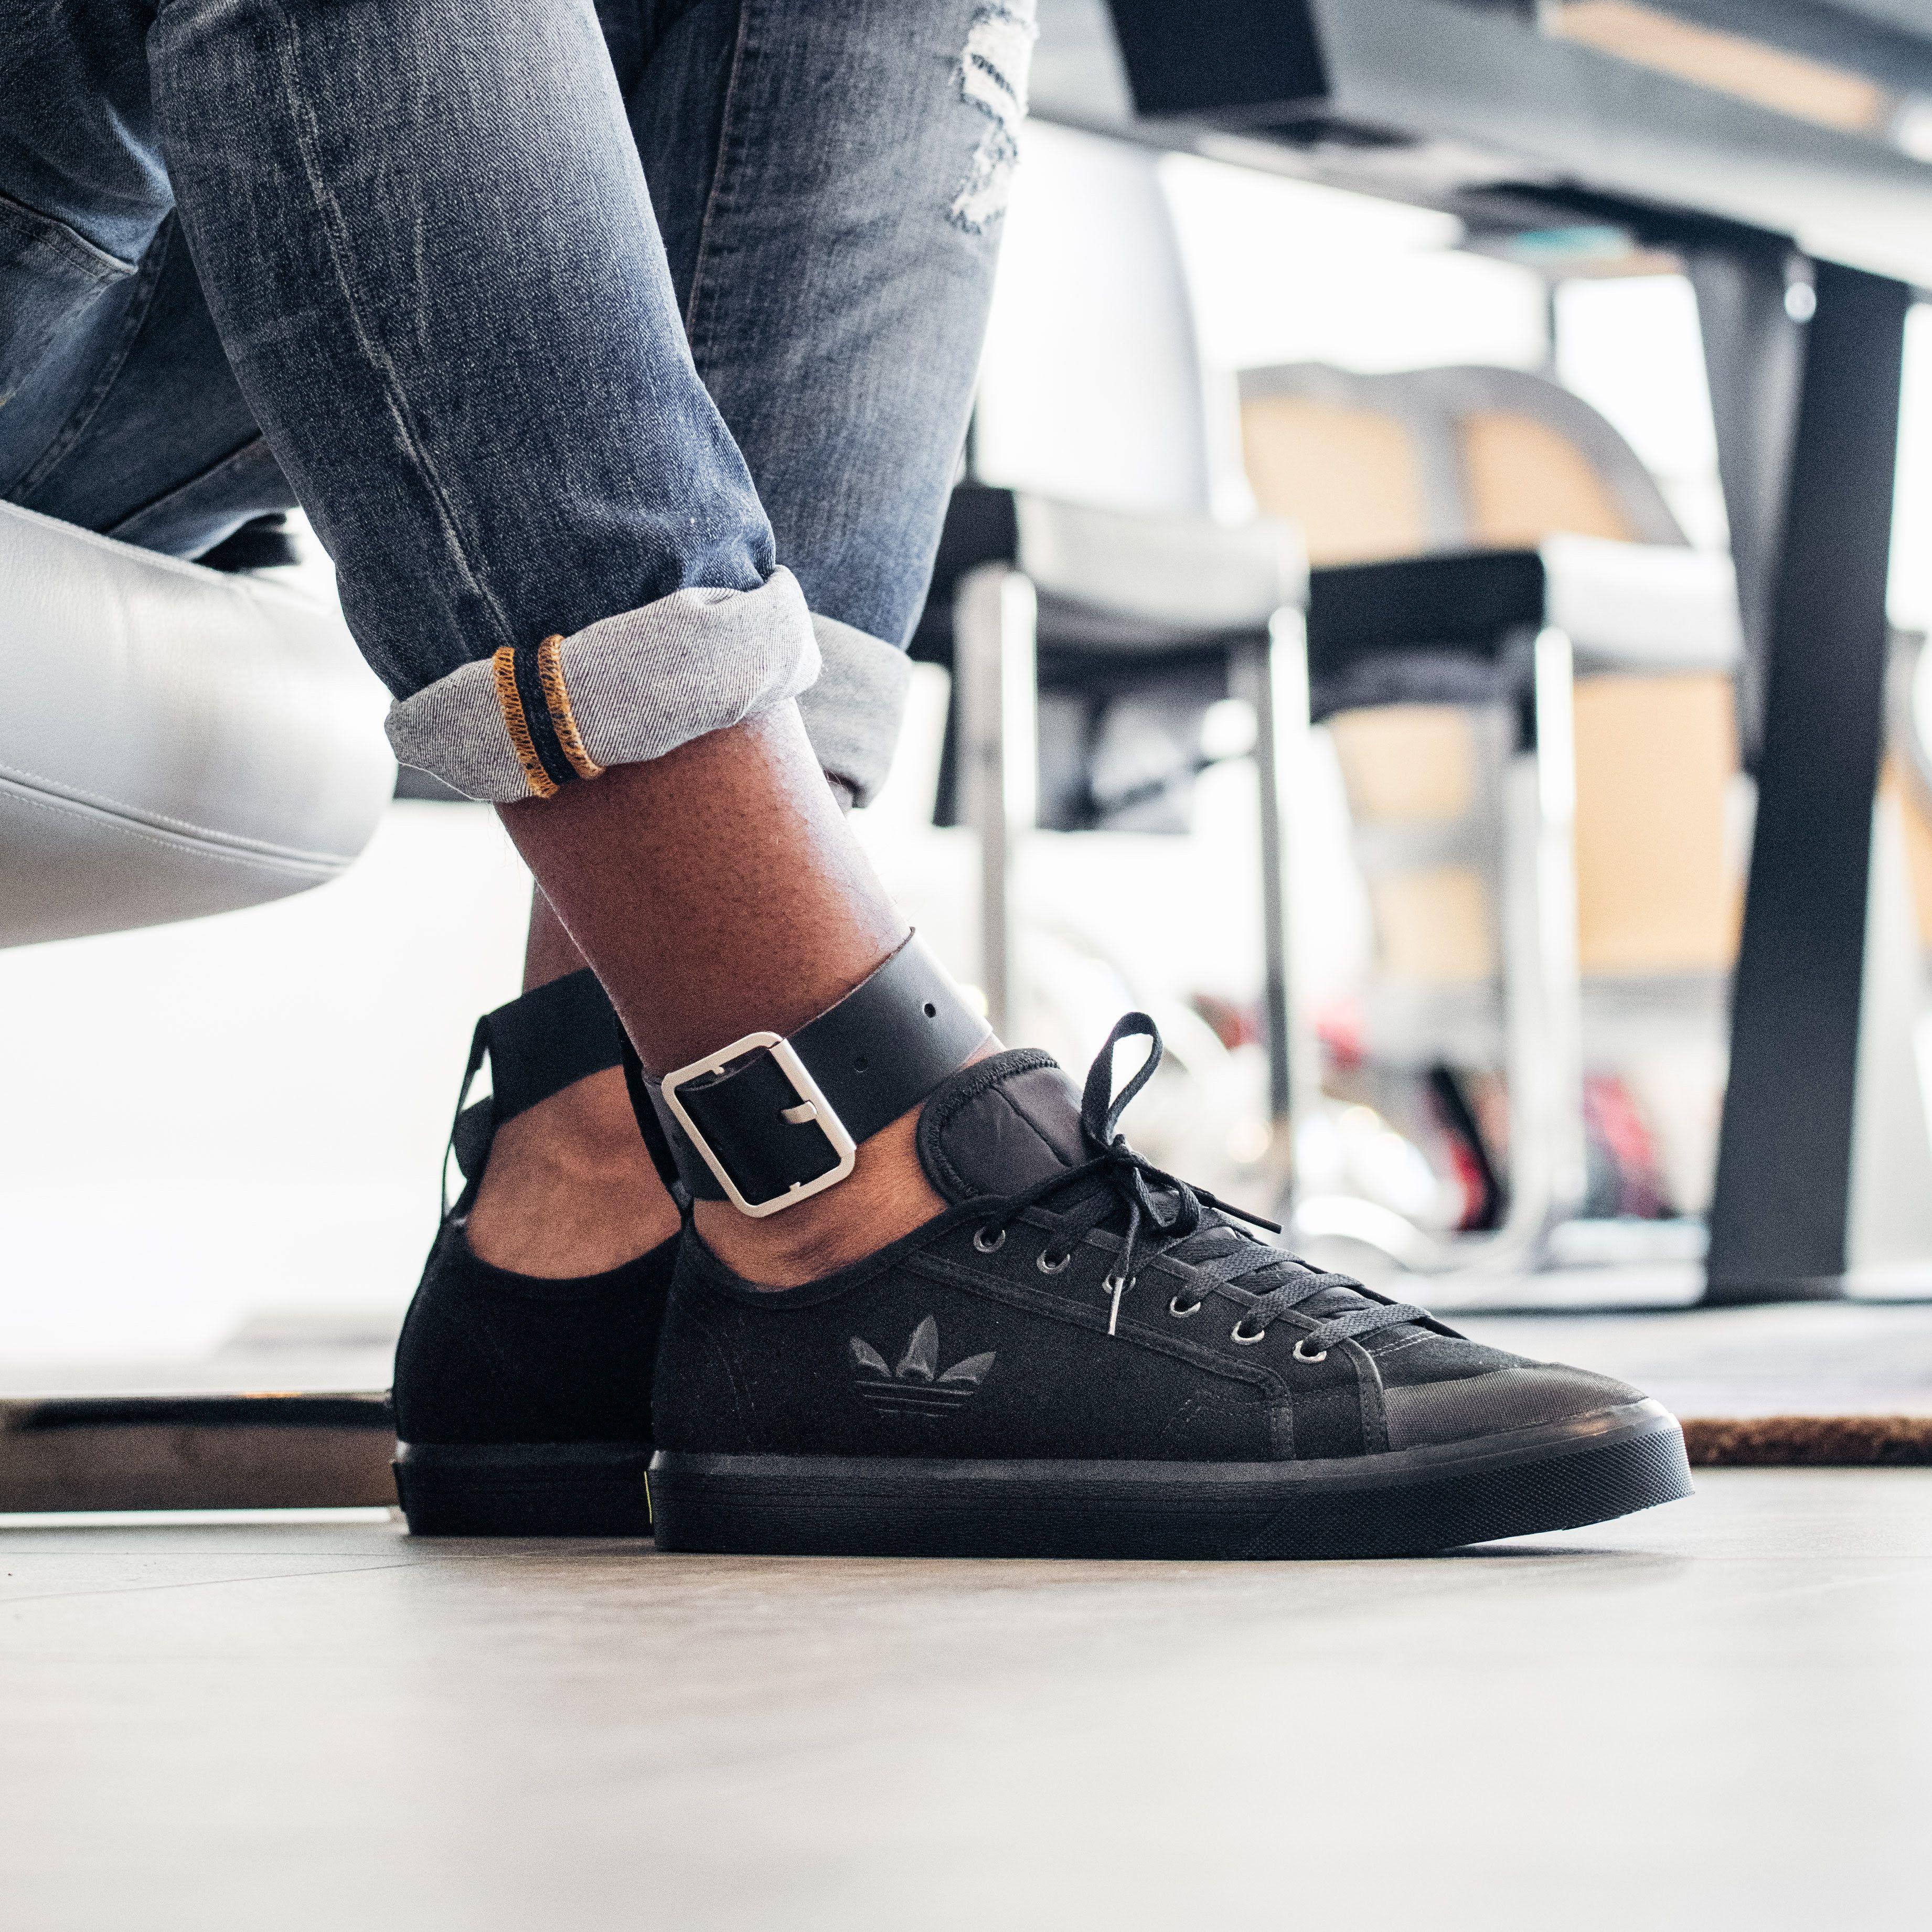 Raf Simons x adidas Spirit Buckle: Black